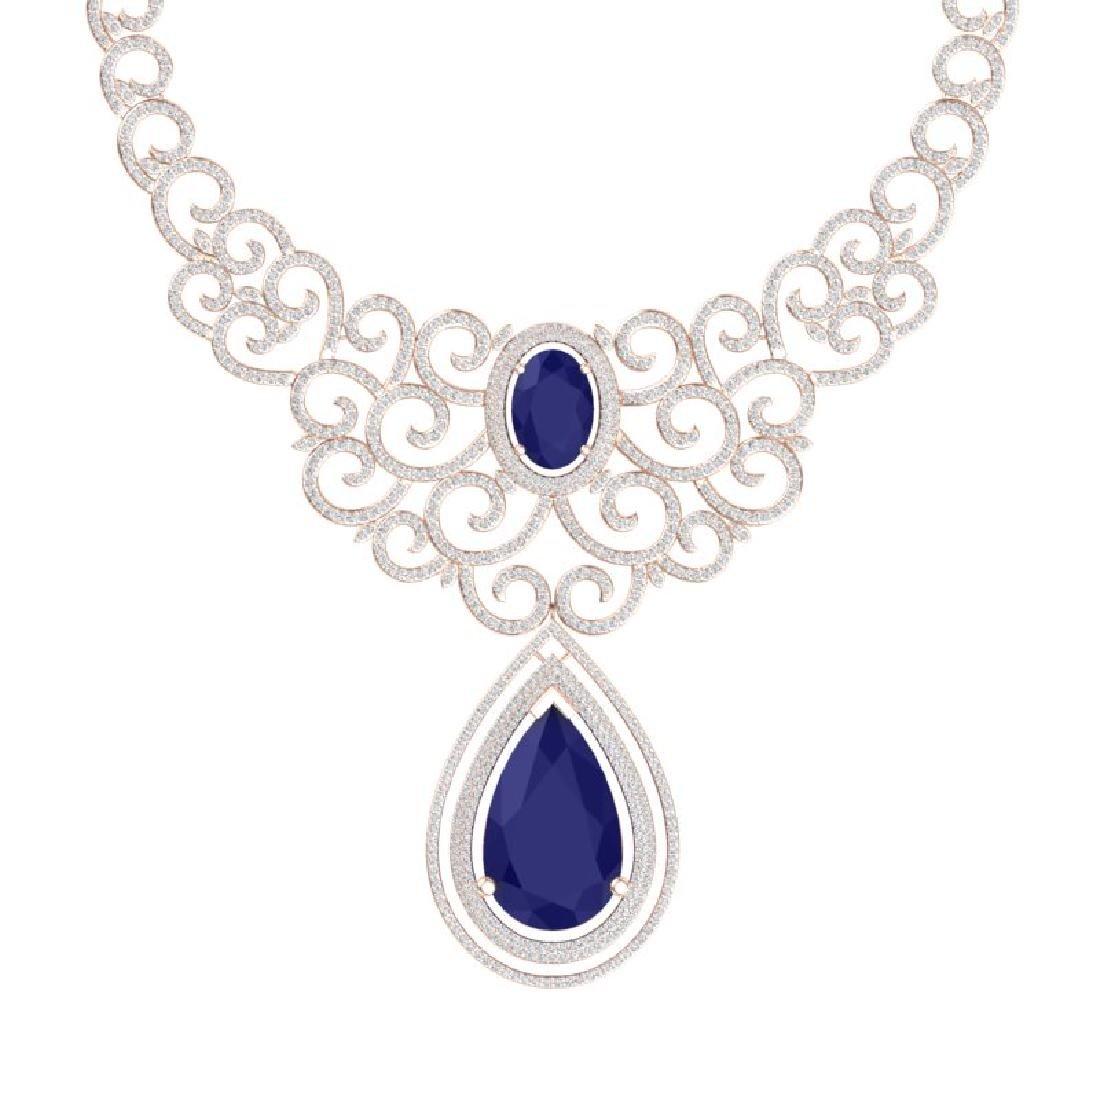 87.52 CTW Royalty Sapphire & VS Diamond Necklace 18K - 2